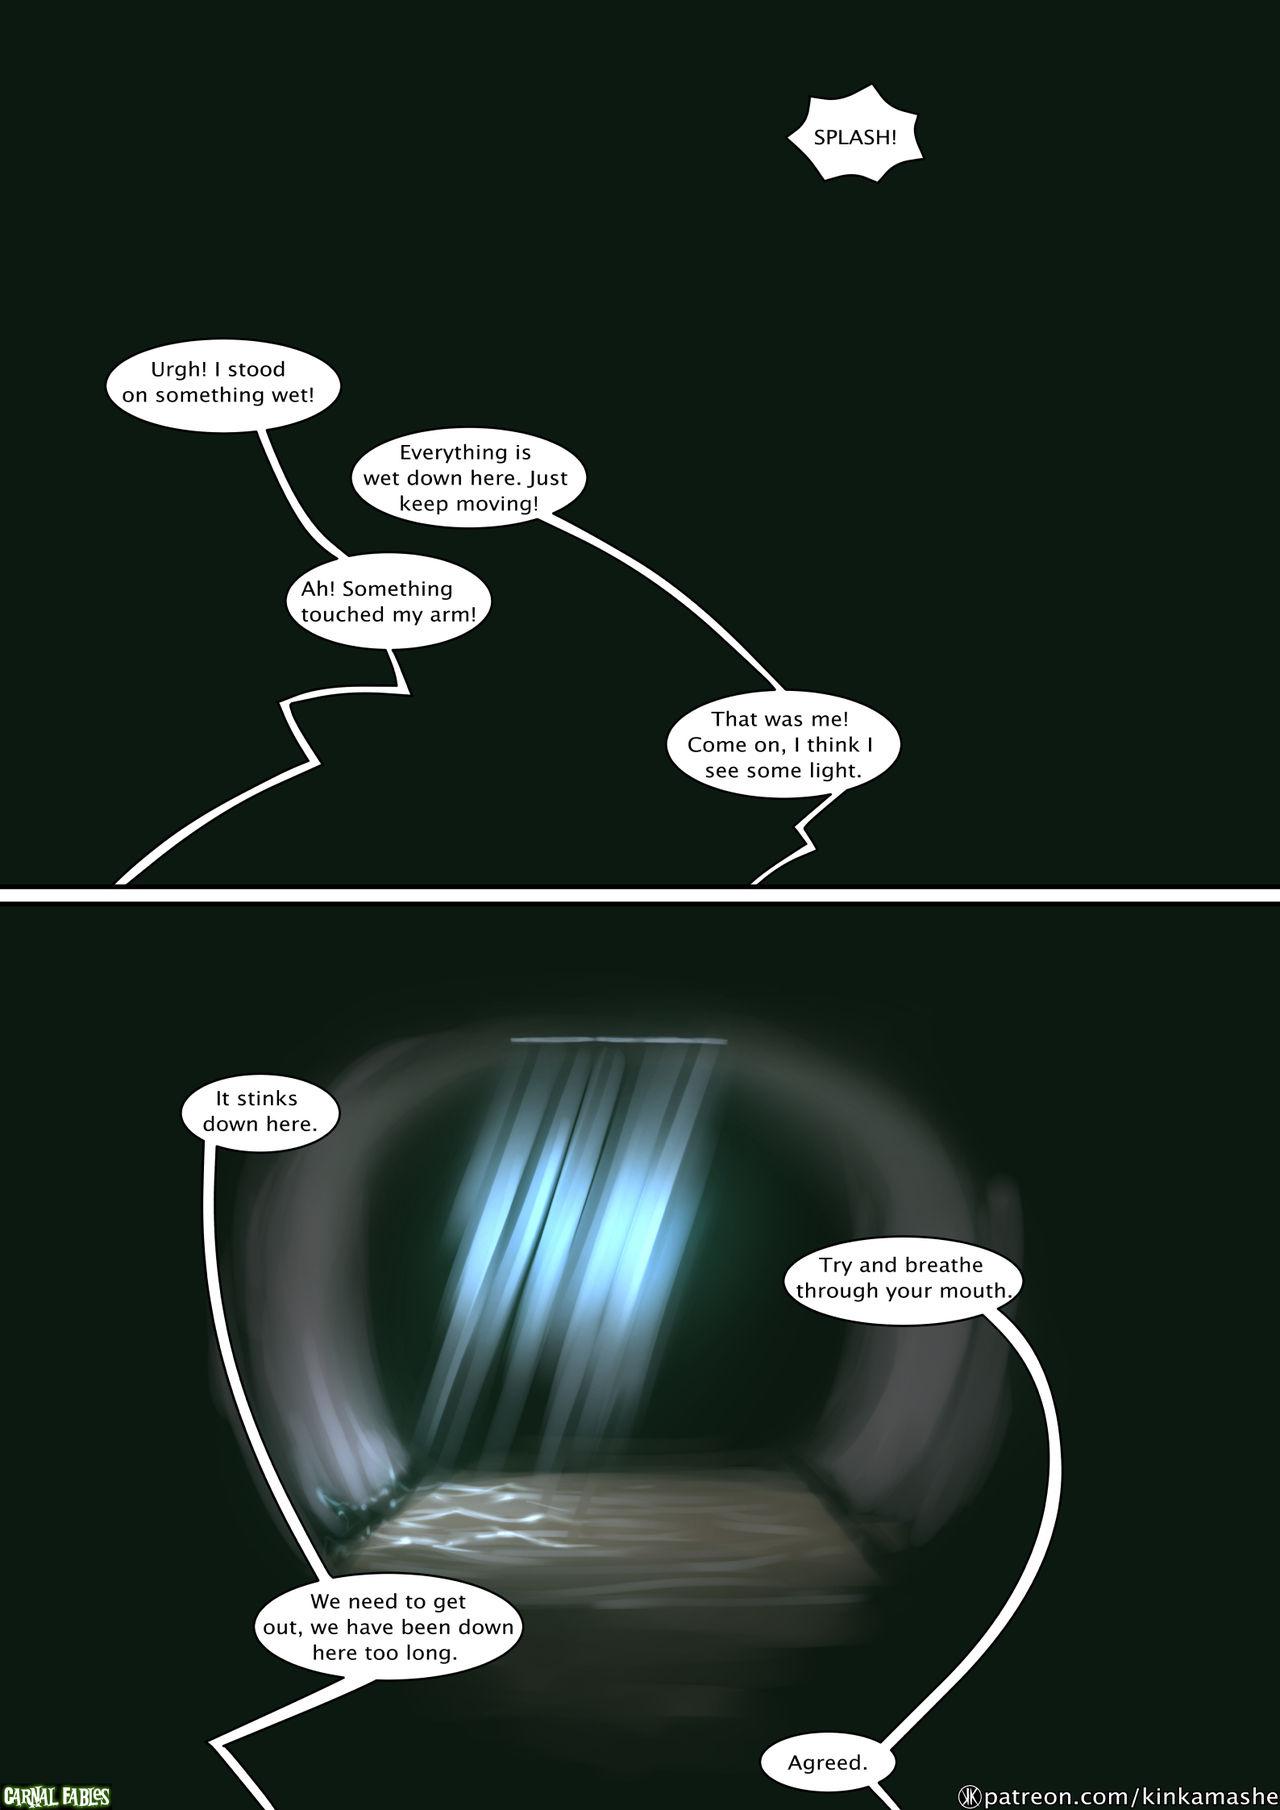 Vex: Hellscape 1-6 porn comics Oral sex, Anal Sex, Big Tits, Blowjob, Creampie, Cum Shots, Cum Swallow, Double Penetration, Elf, Group Sex, Hardcore, Masturbation, Rape, Sex Toys, Straight, X-Ray